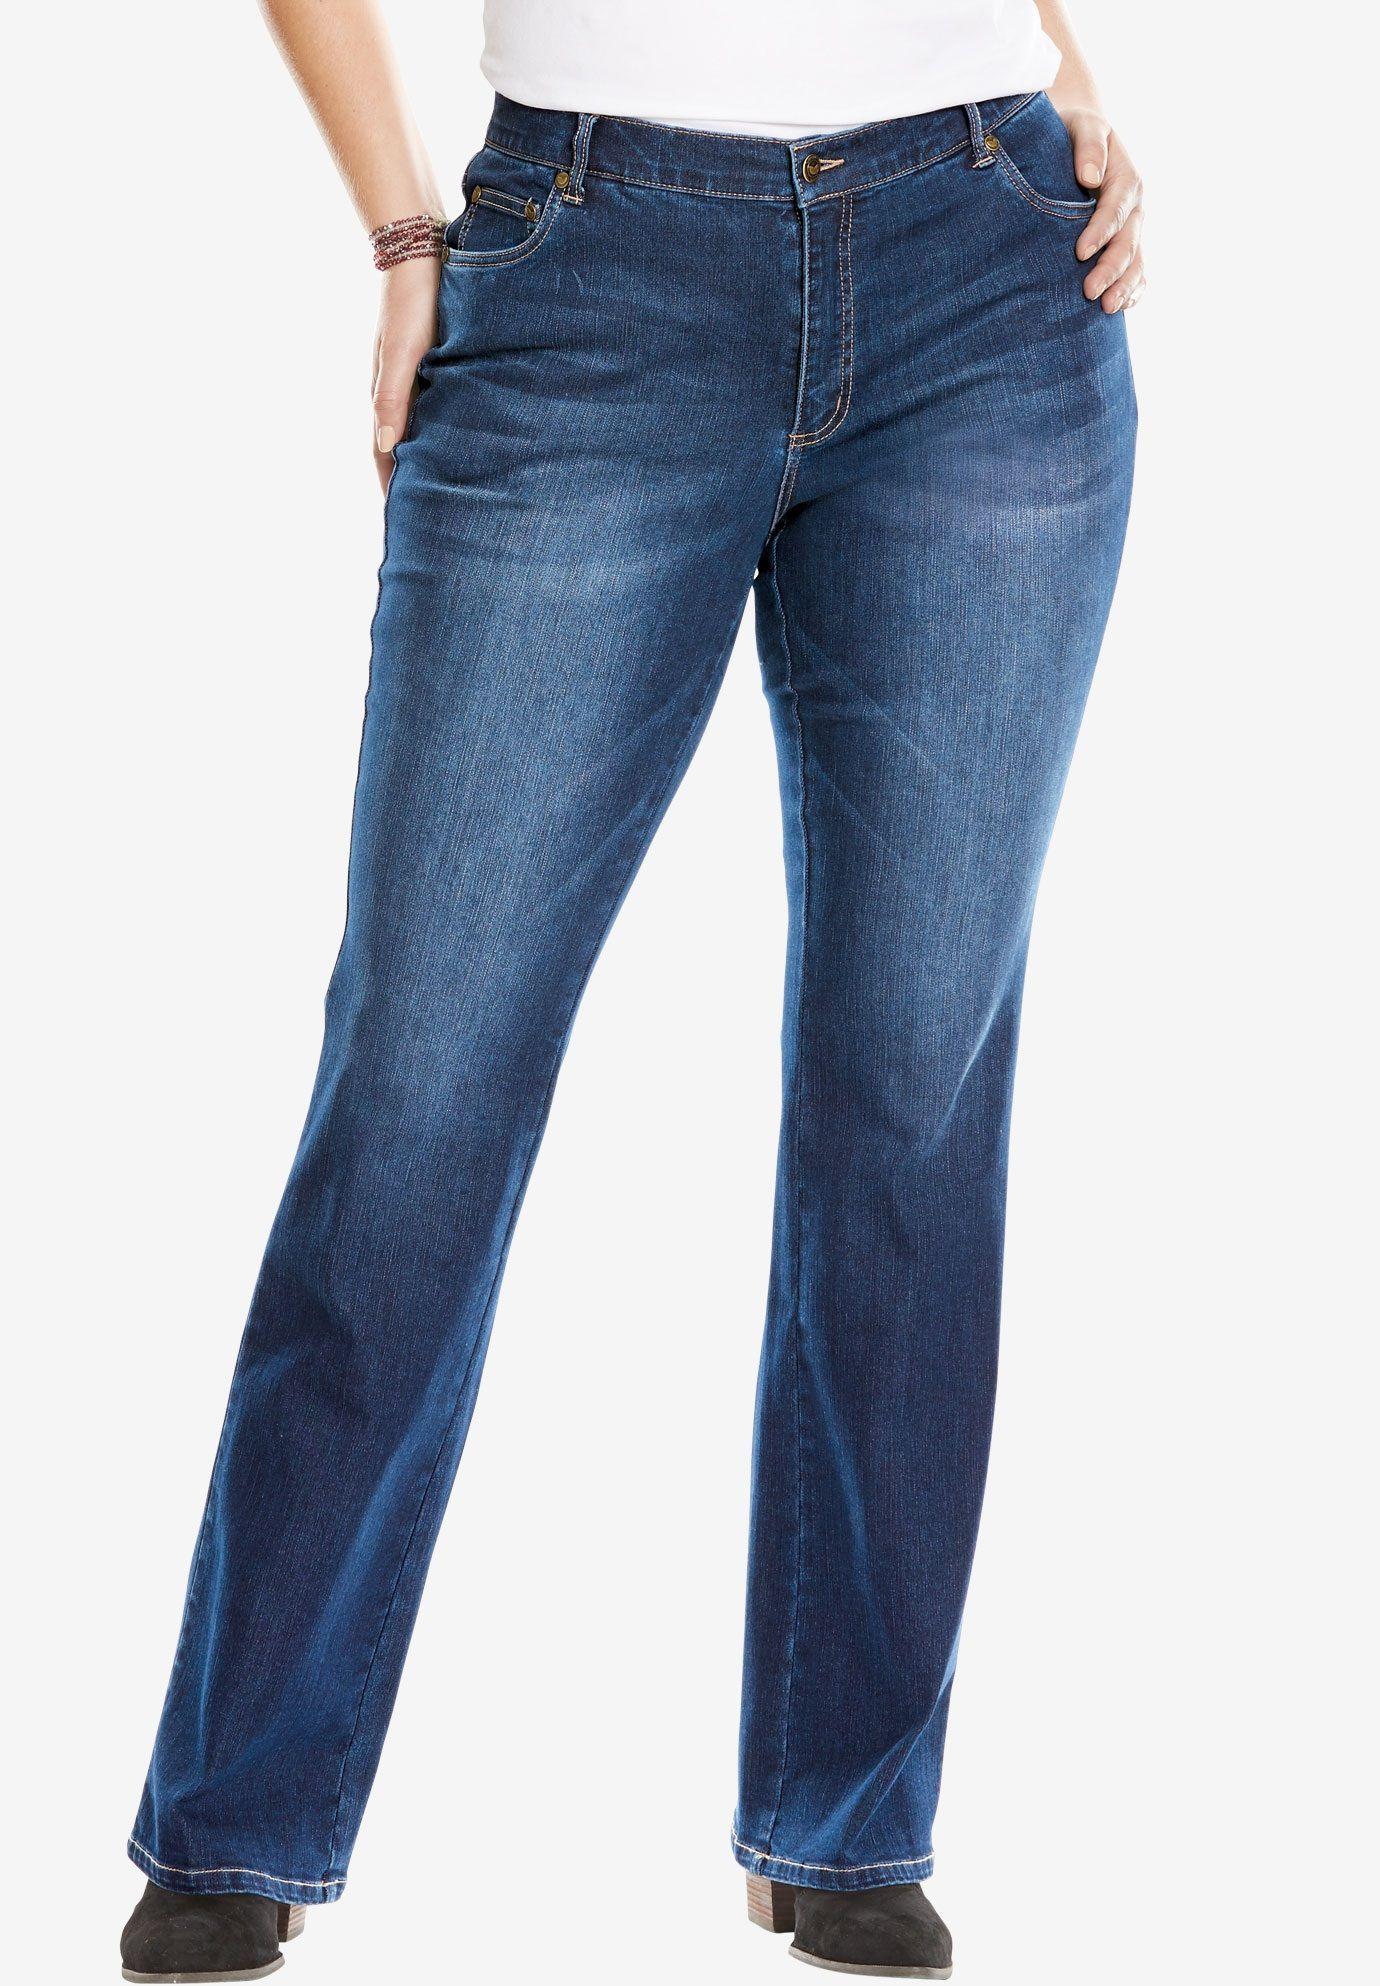 7aff9b4ea6b Bootcut Stretch Jean - Women s Plus Size Clothing